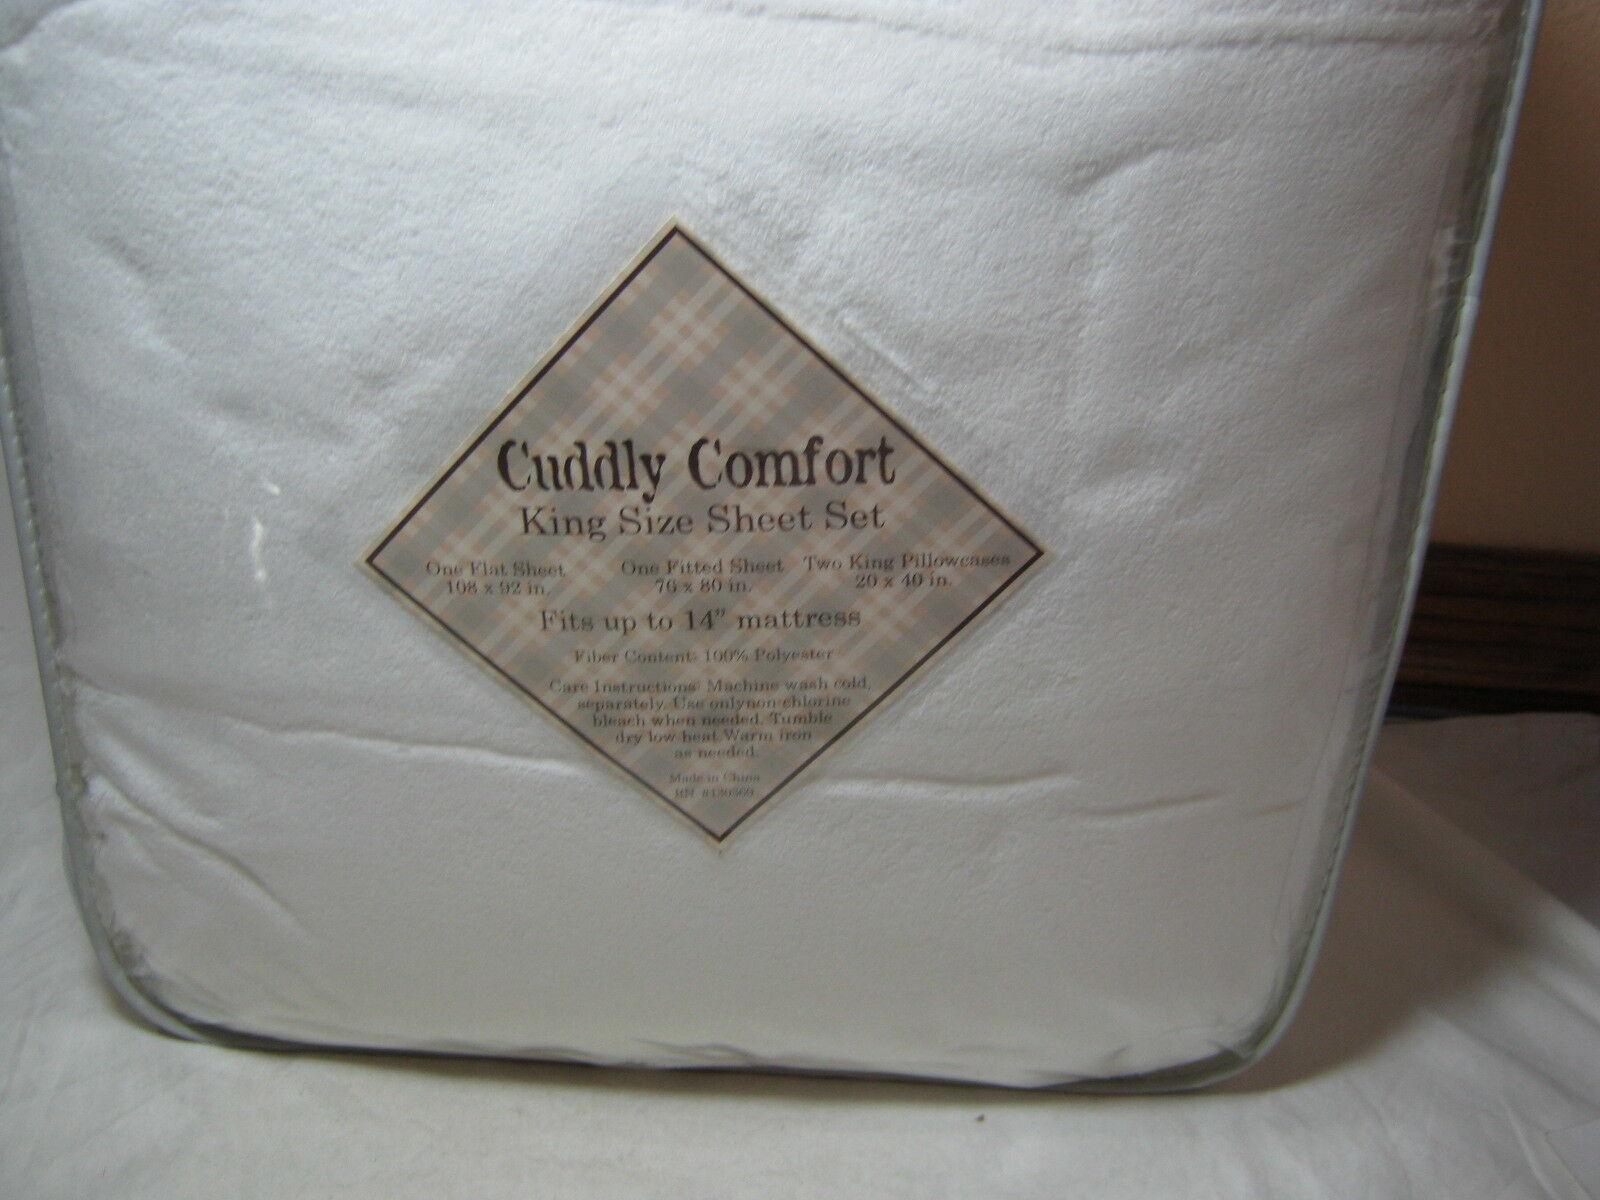 New Super Soft and Comfy Cuddly Comfort King Größe Sheet Set - Weiß - NIP